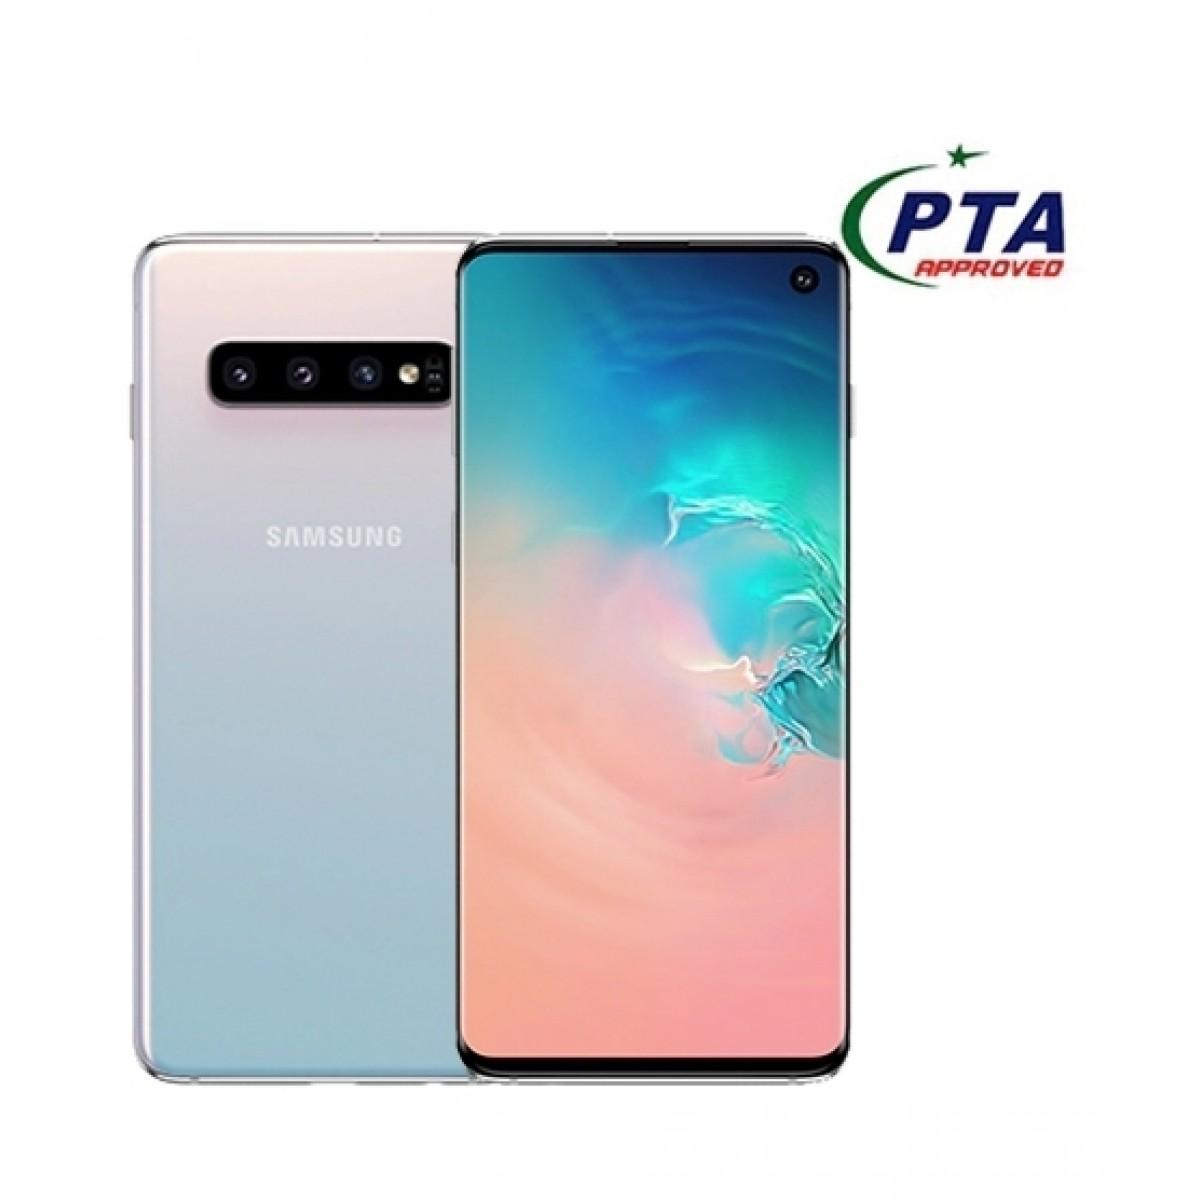 Samsung Galaxy S10 128GB Dual Sim Prism White - Official Warranty